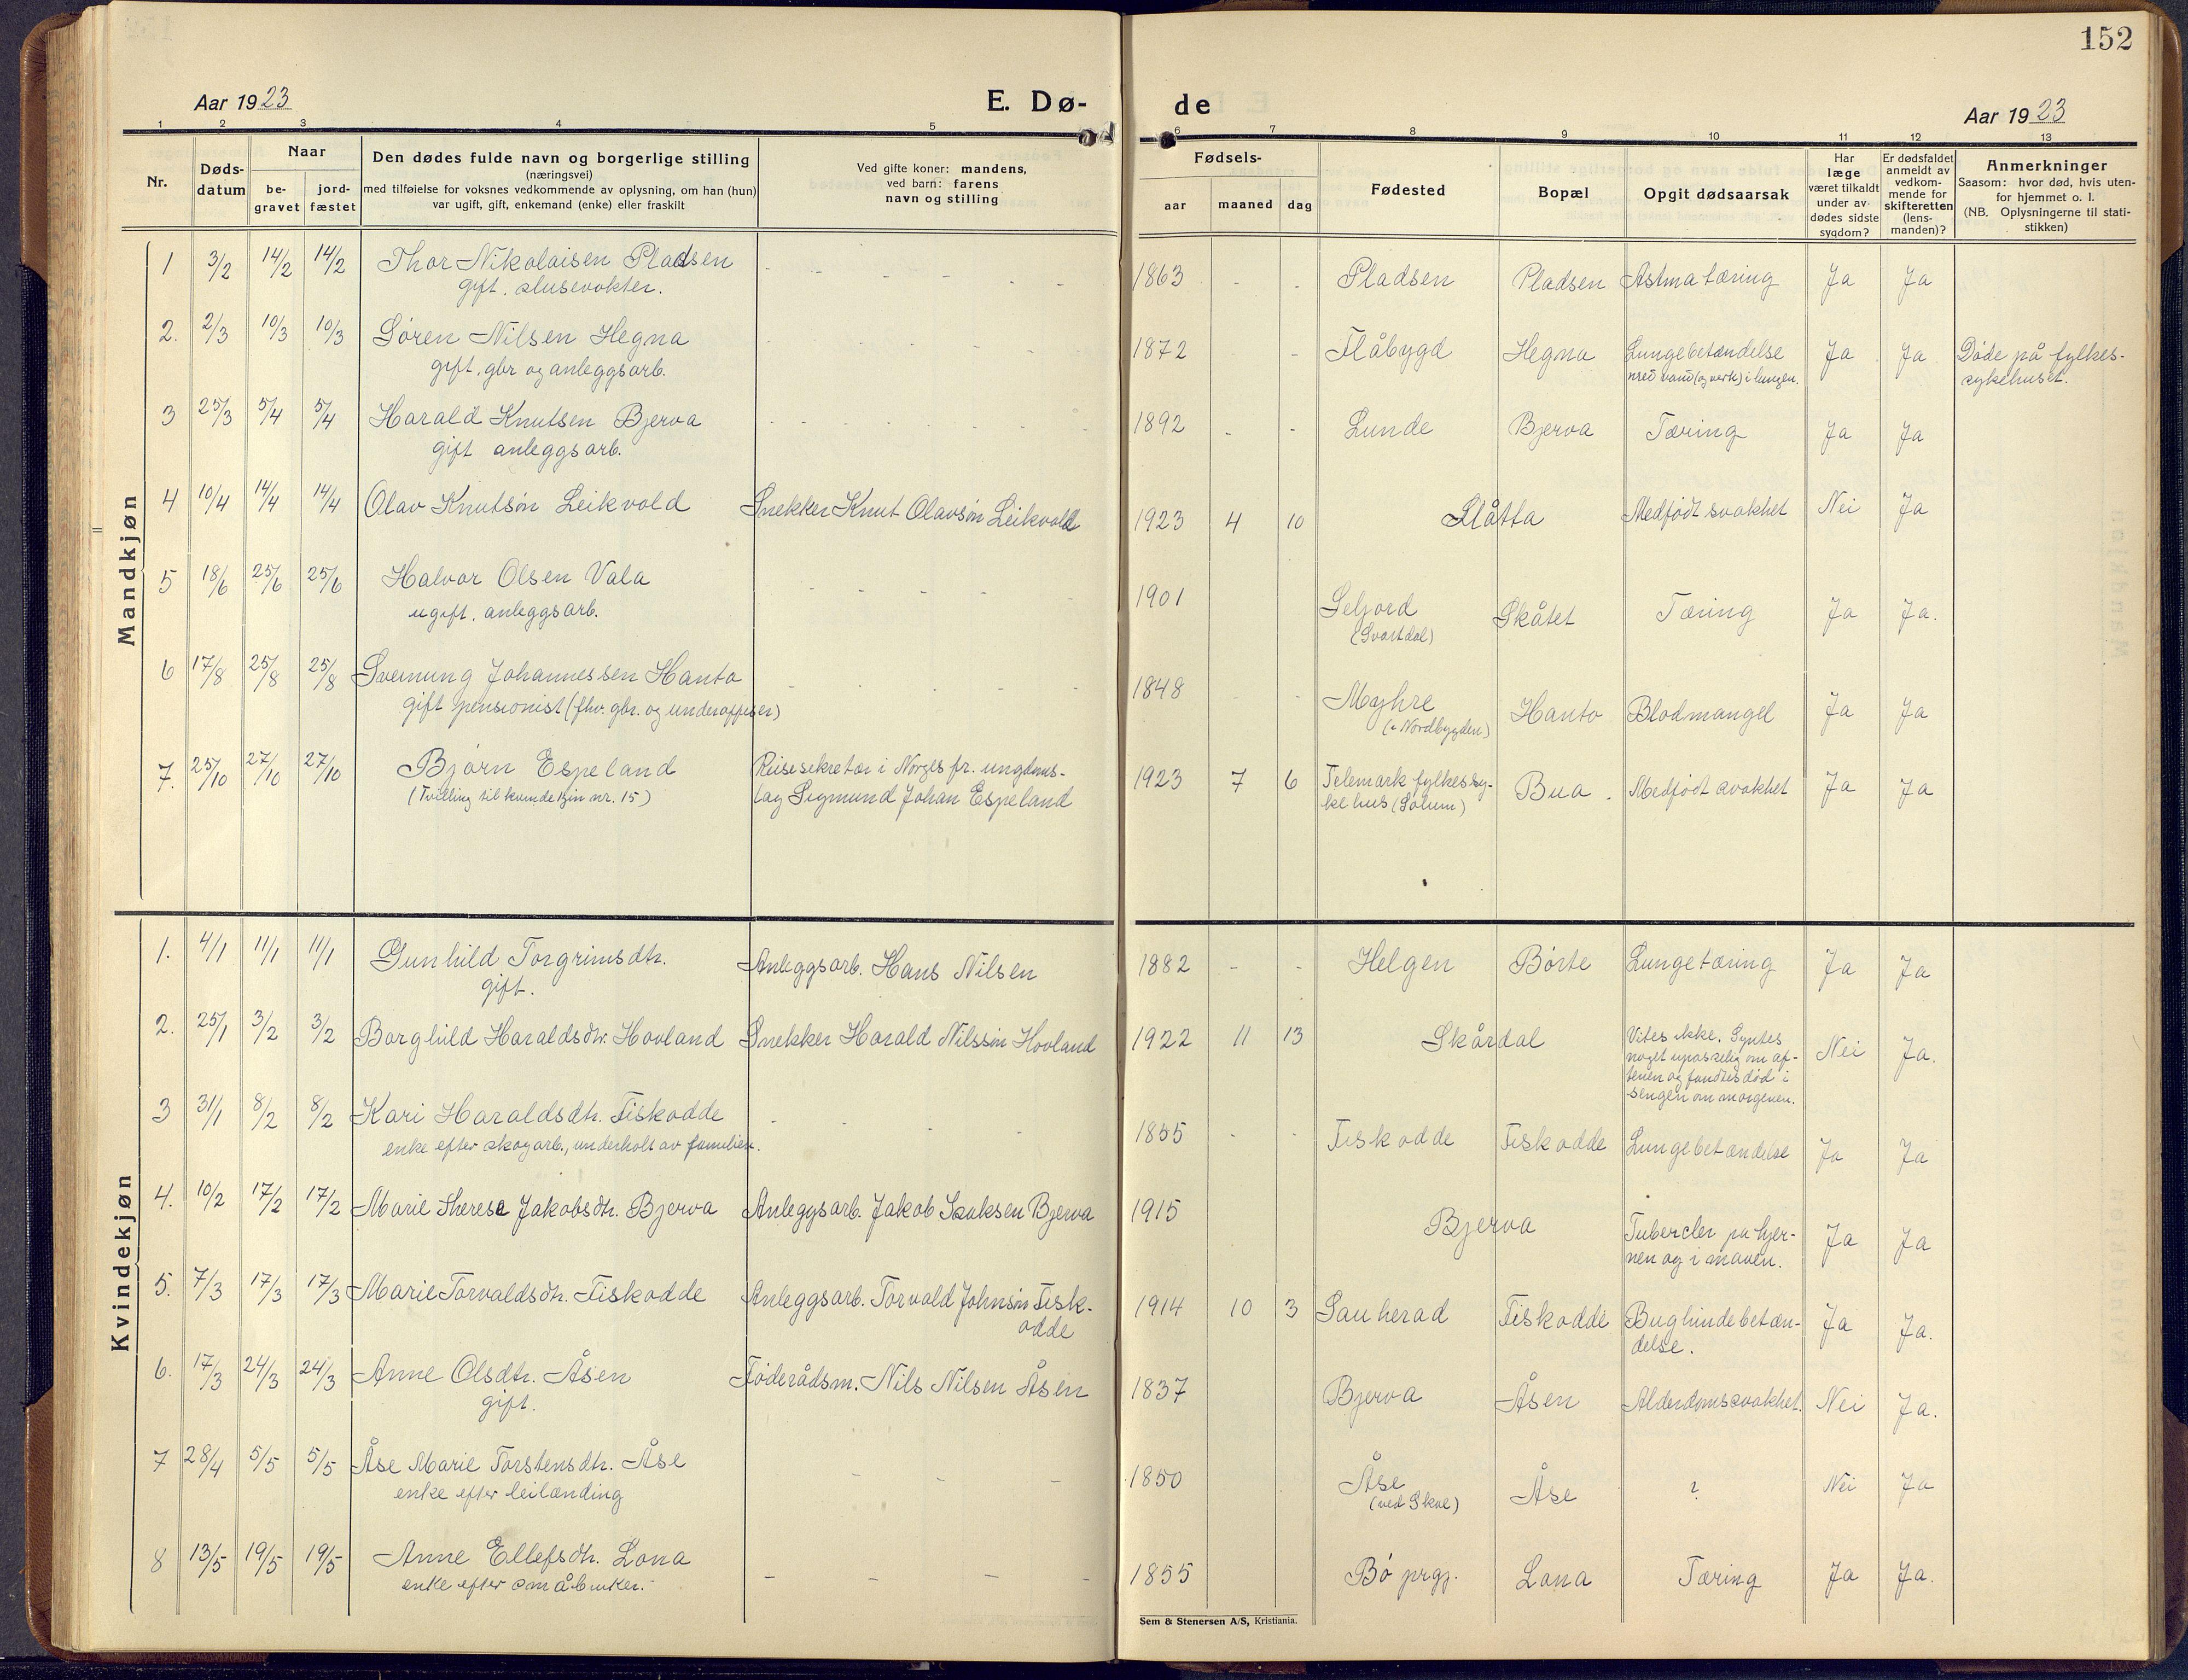 SAKO, Lunde kirkebøker, F/Fa/L0006: Ministerialbok nr. I 6, 1922-1940, s. 152